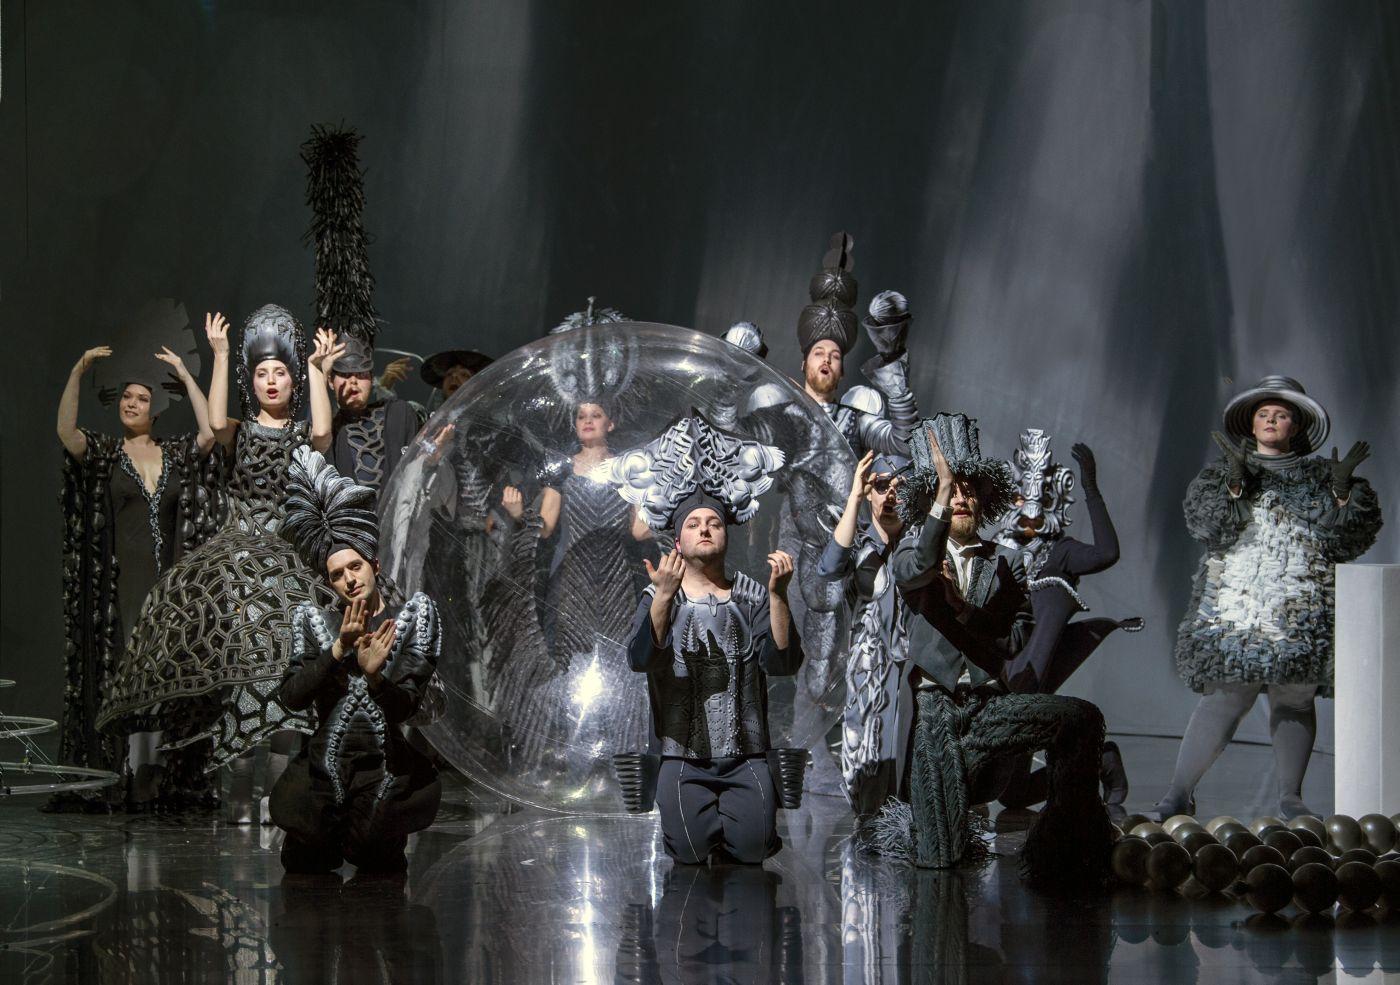 Ritratto - De Nationale Opera - credits Ruth Walz 0002_1.j